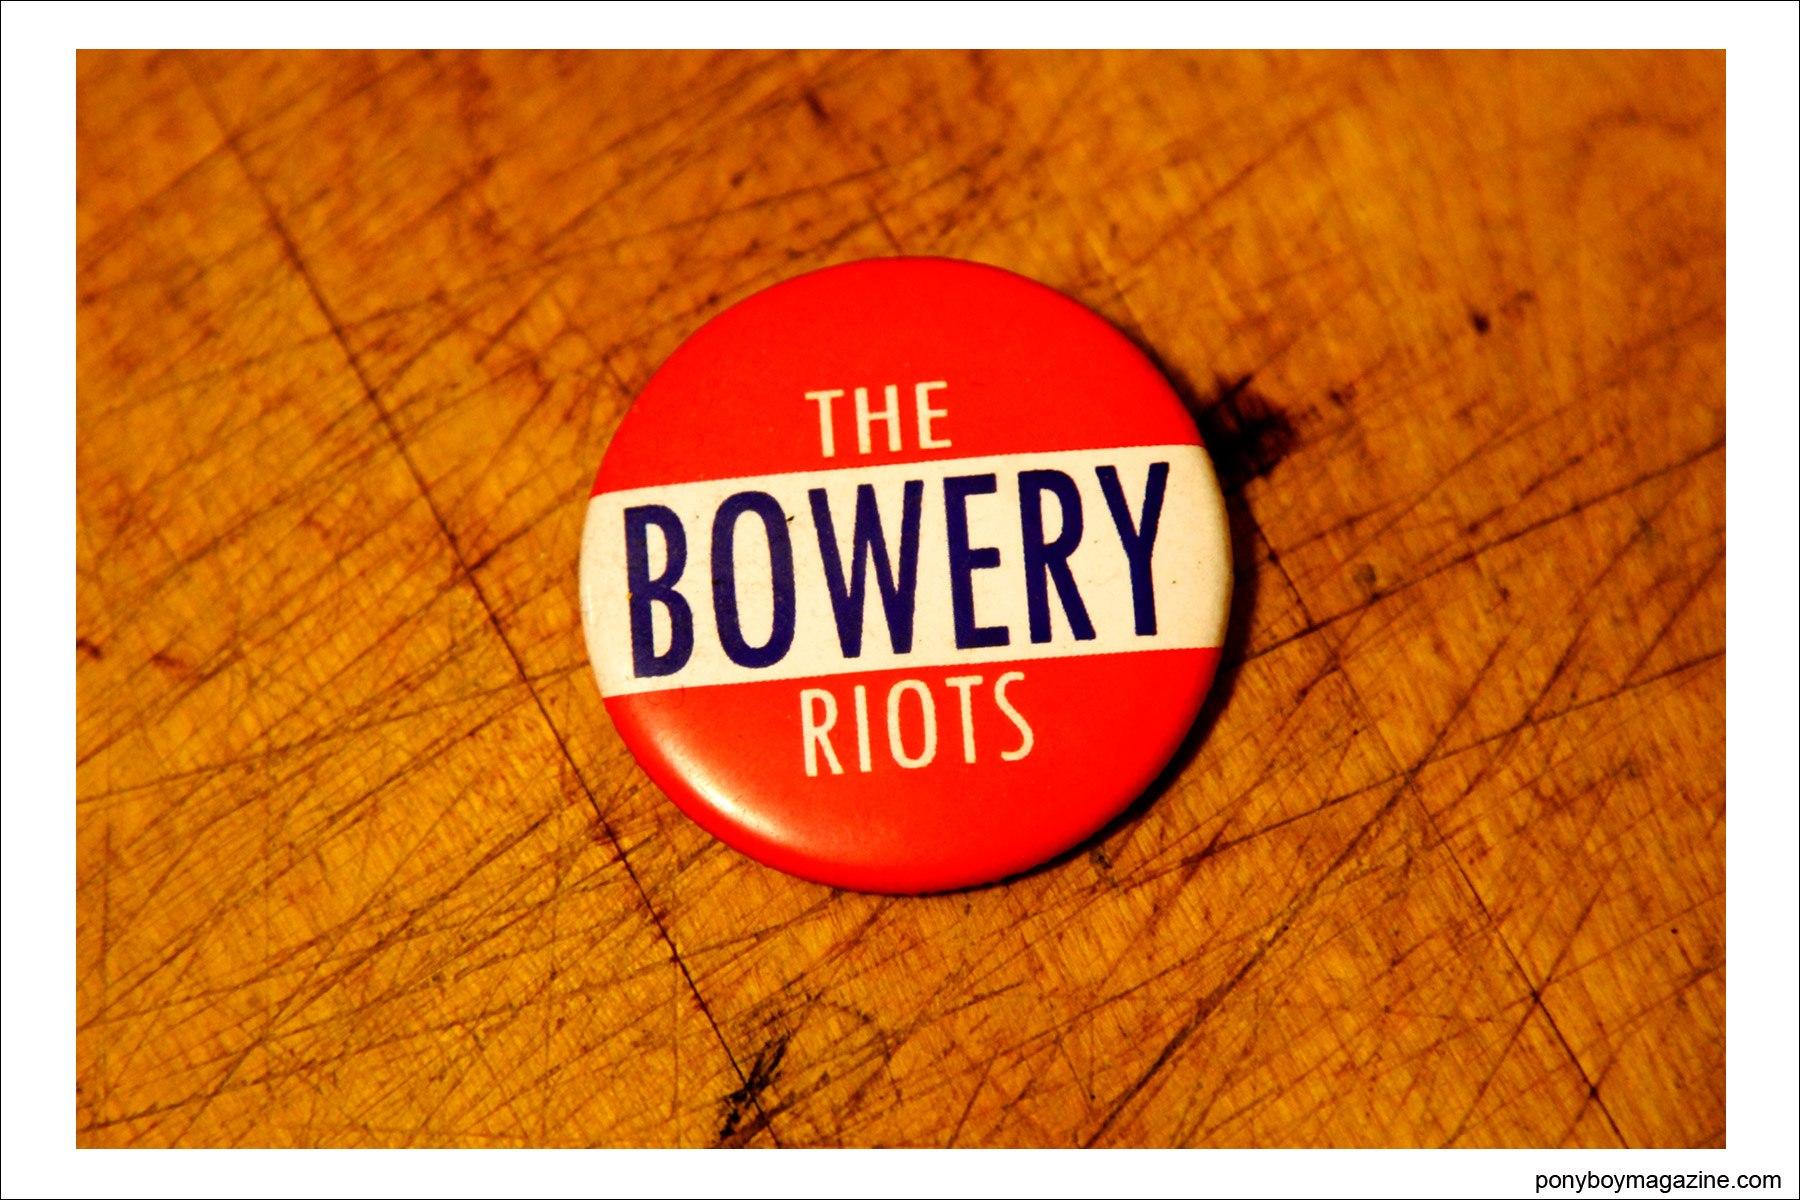 A Bowery Riots pin, property of musician Justin Dean Thomas. Ponyboy magazine